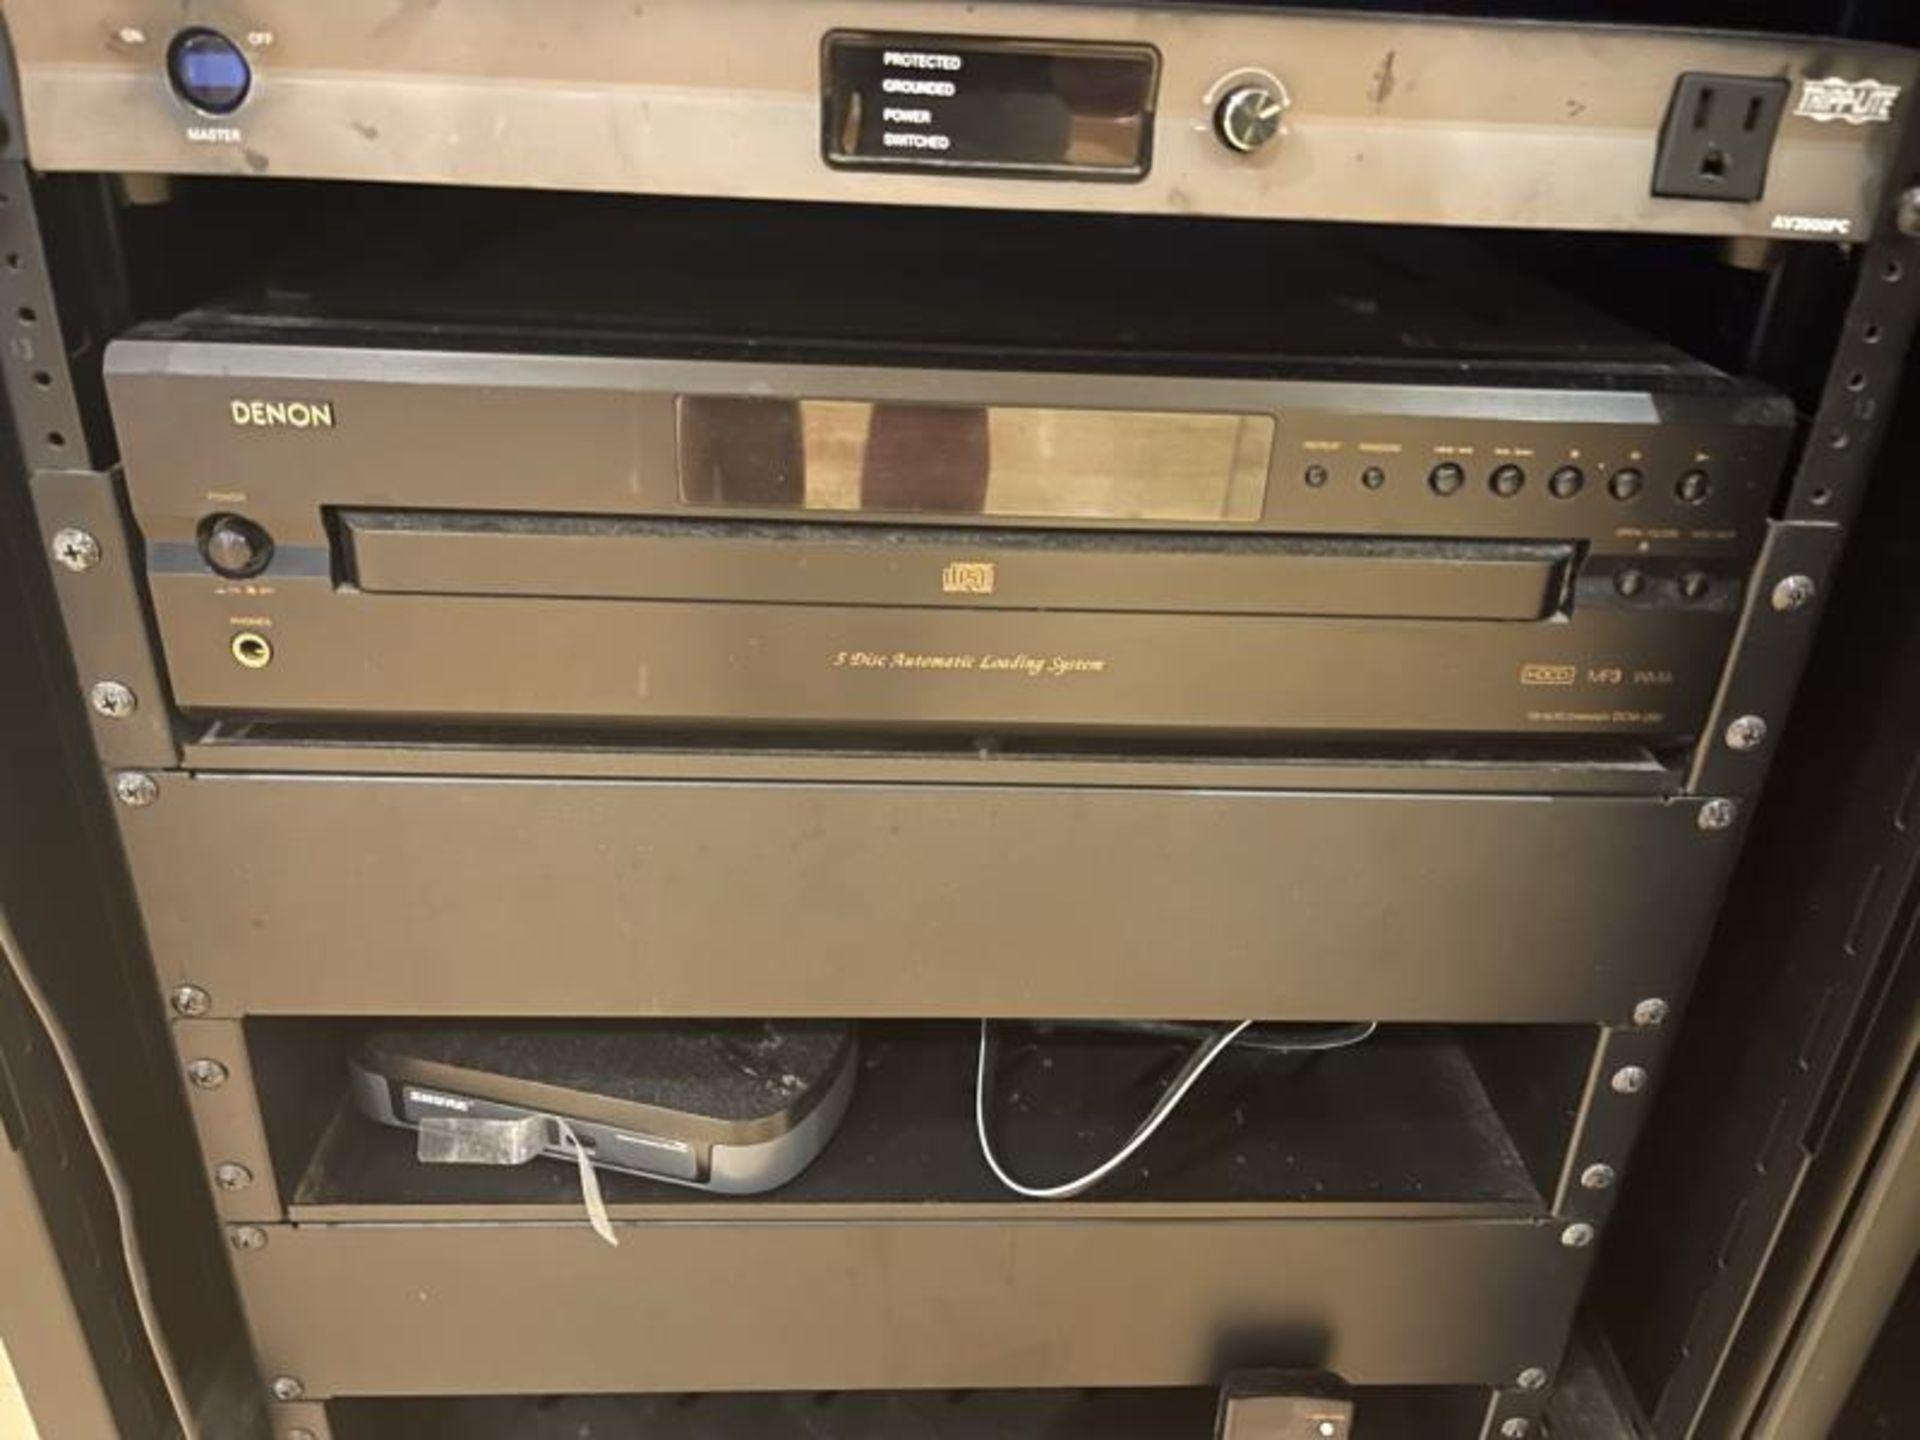 Omnimount Design Audio Cabinet with Crown 1160MA Tripplite AV3500PD, Denon 5 Disk CD Changer, Shure - Image 3 of 4